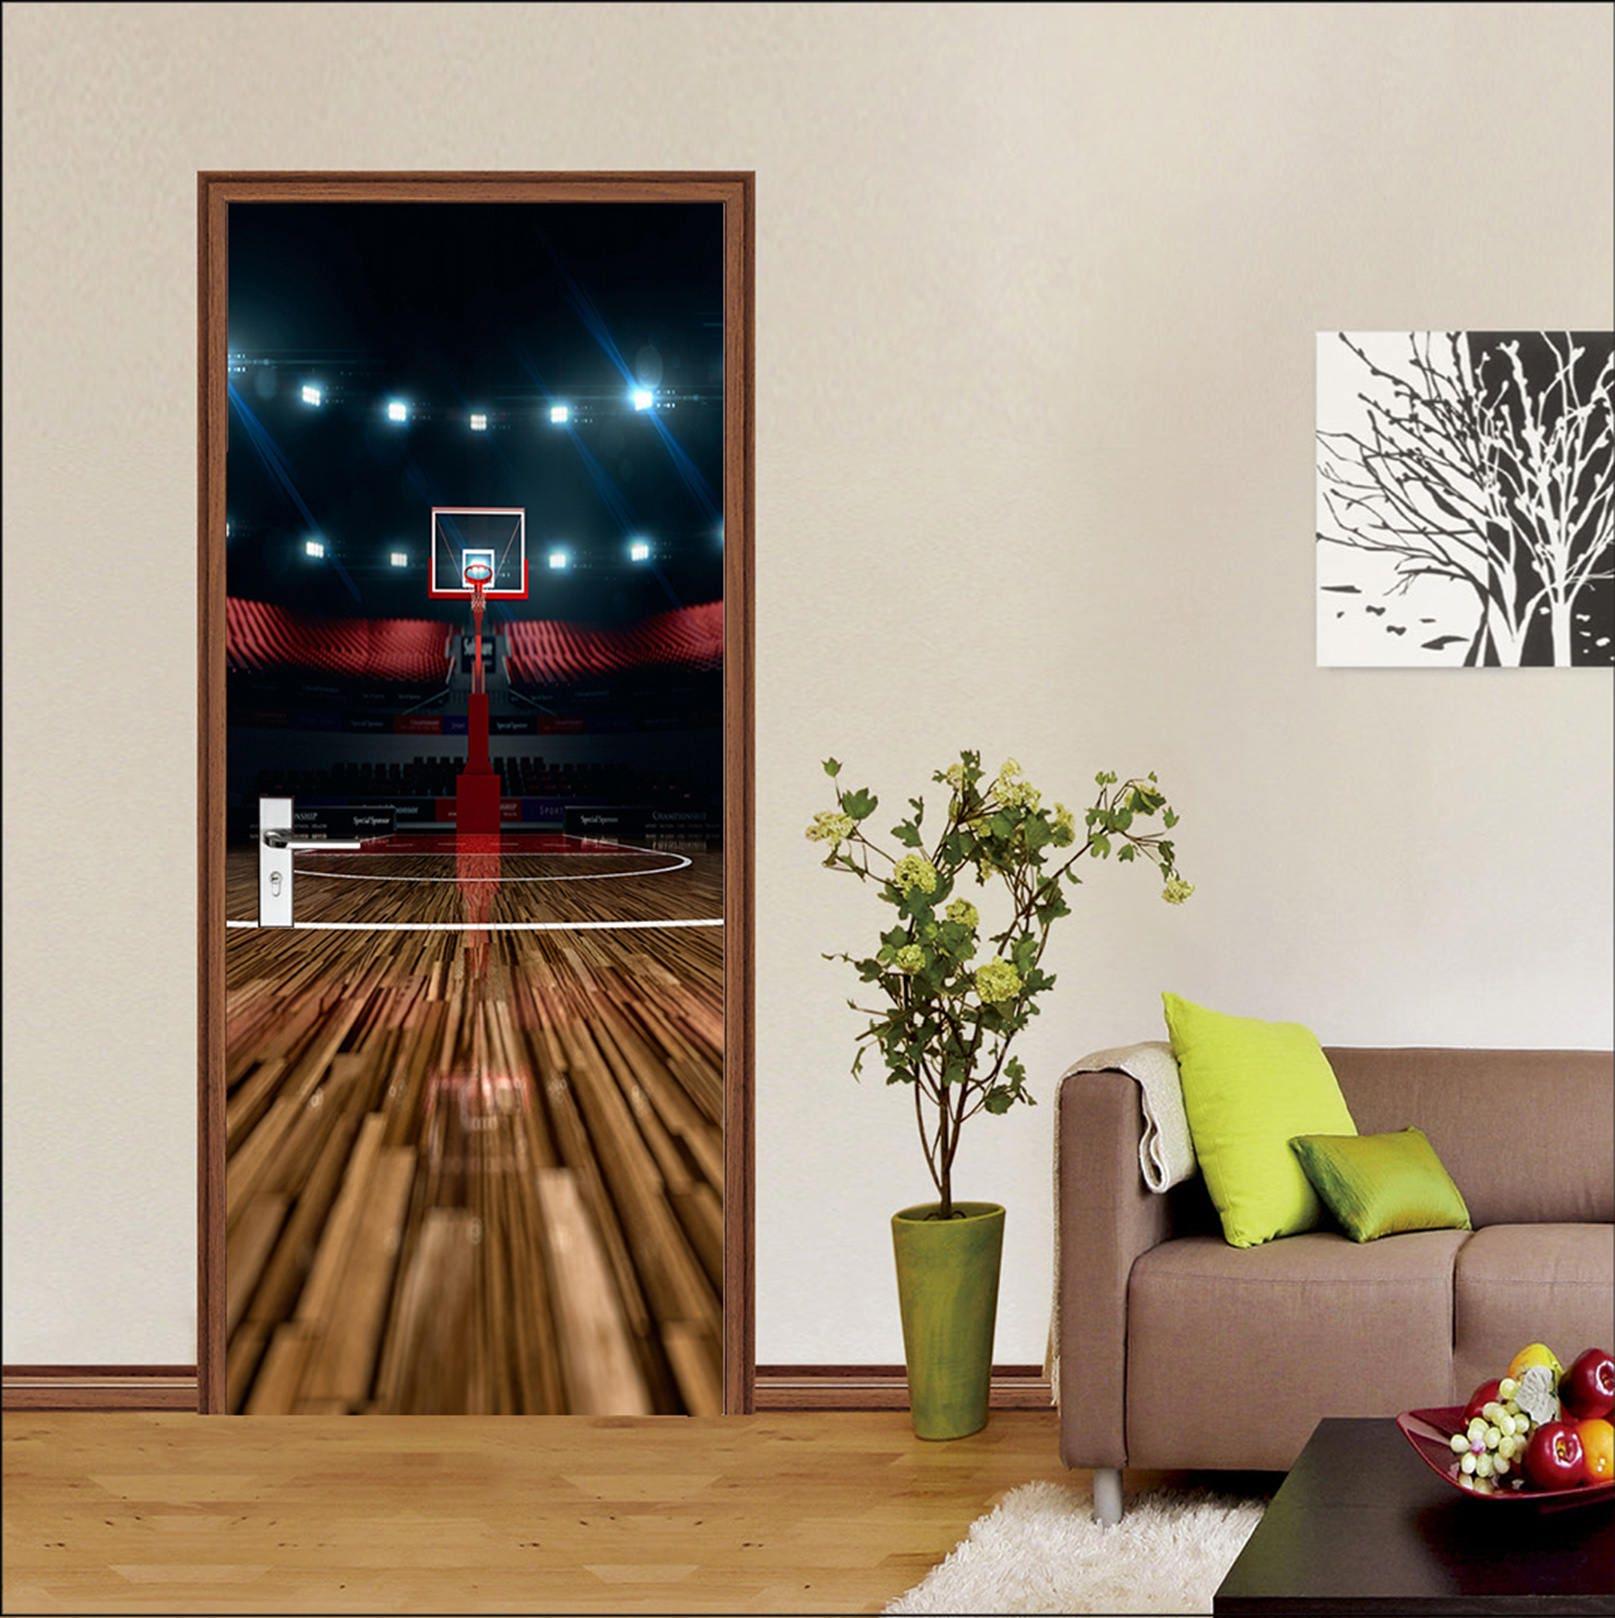 Basketball wall murals images home wall decoration ideas 3d basketball court 513 view mural door wallpaper mural wall print 3d basketball court 513 view amipublicfo Gallery